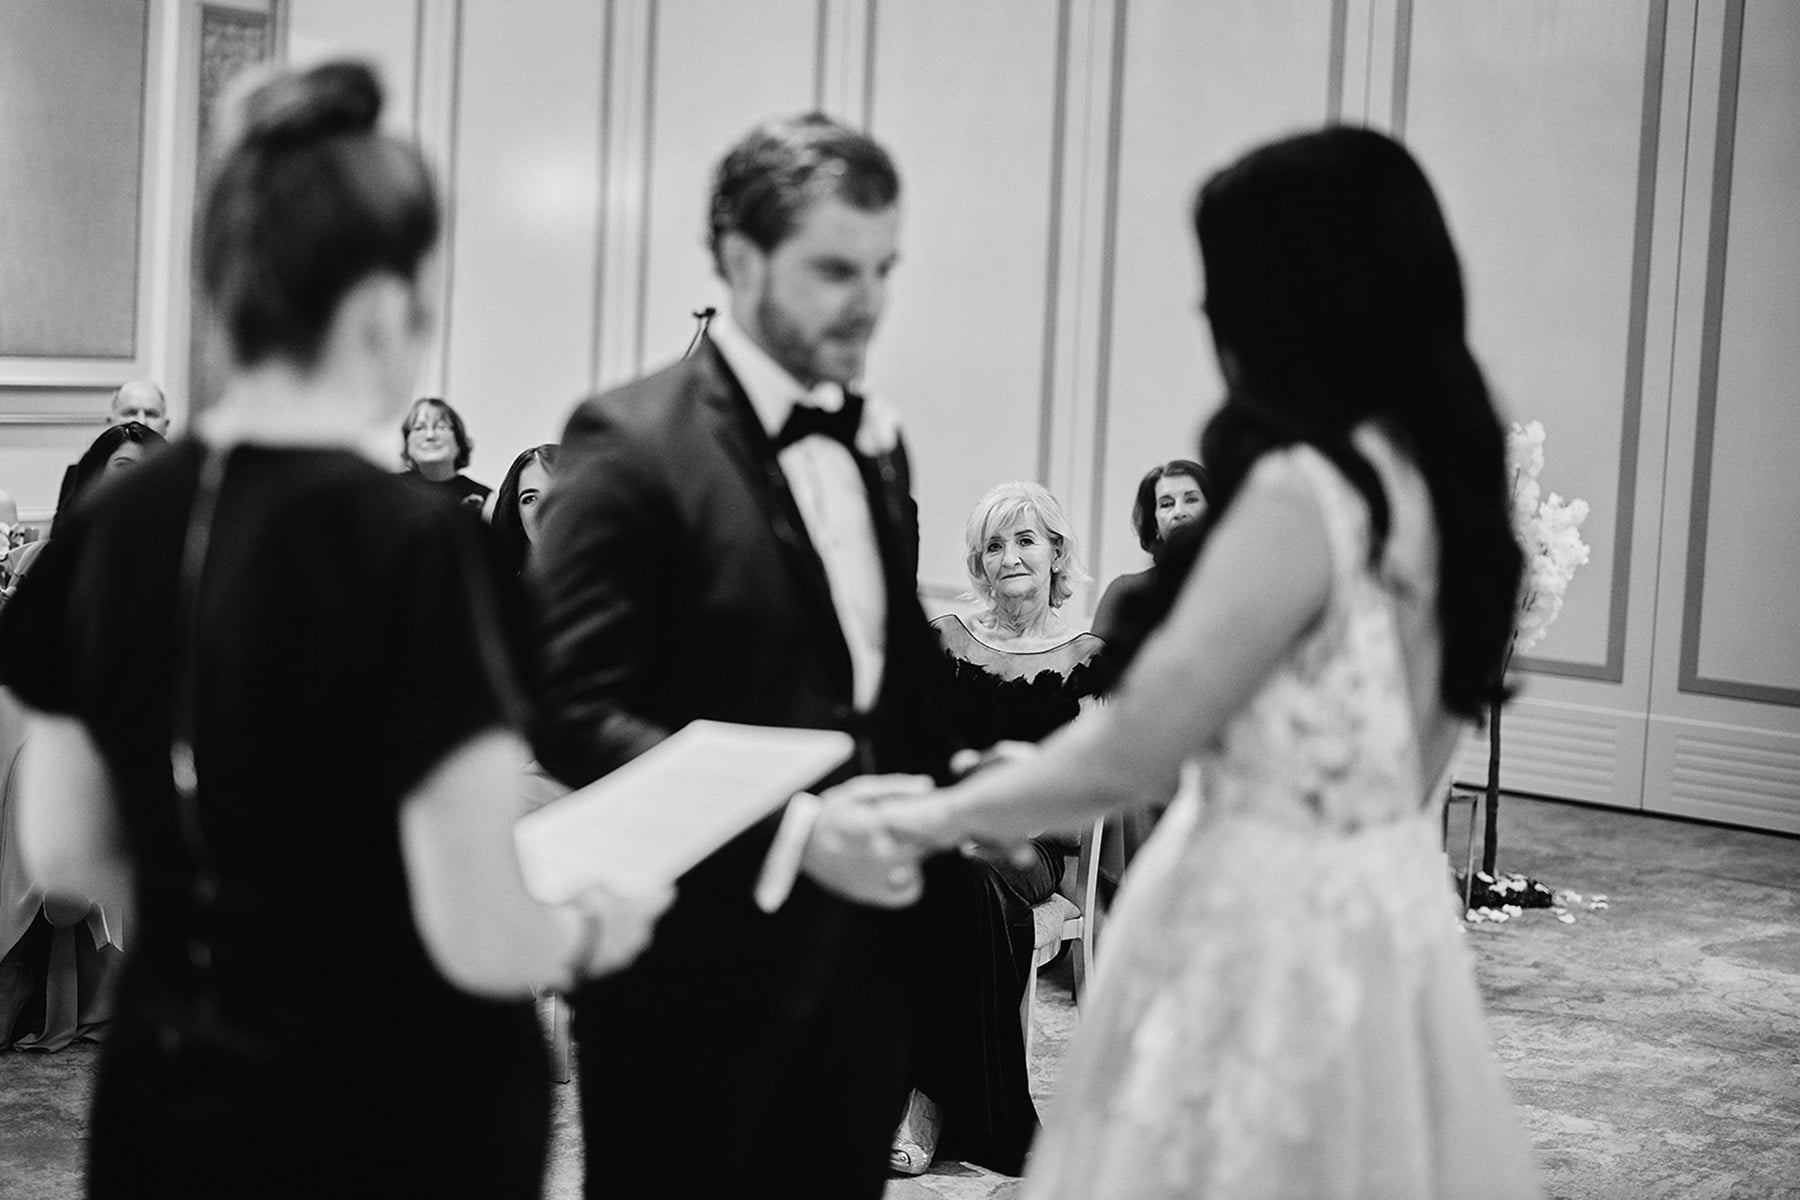 POWERSCOURT HOTEL RESORT INTIMATE WEDDING 55